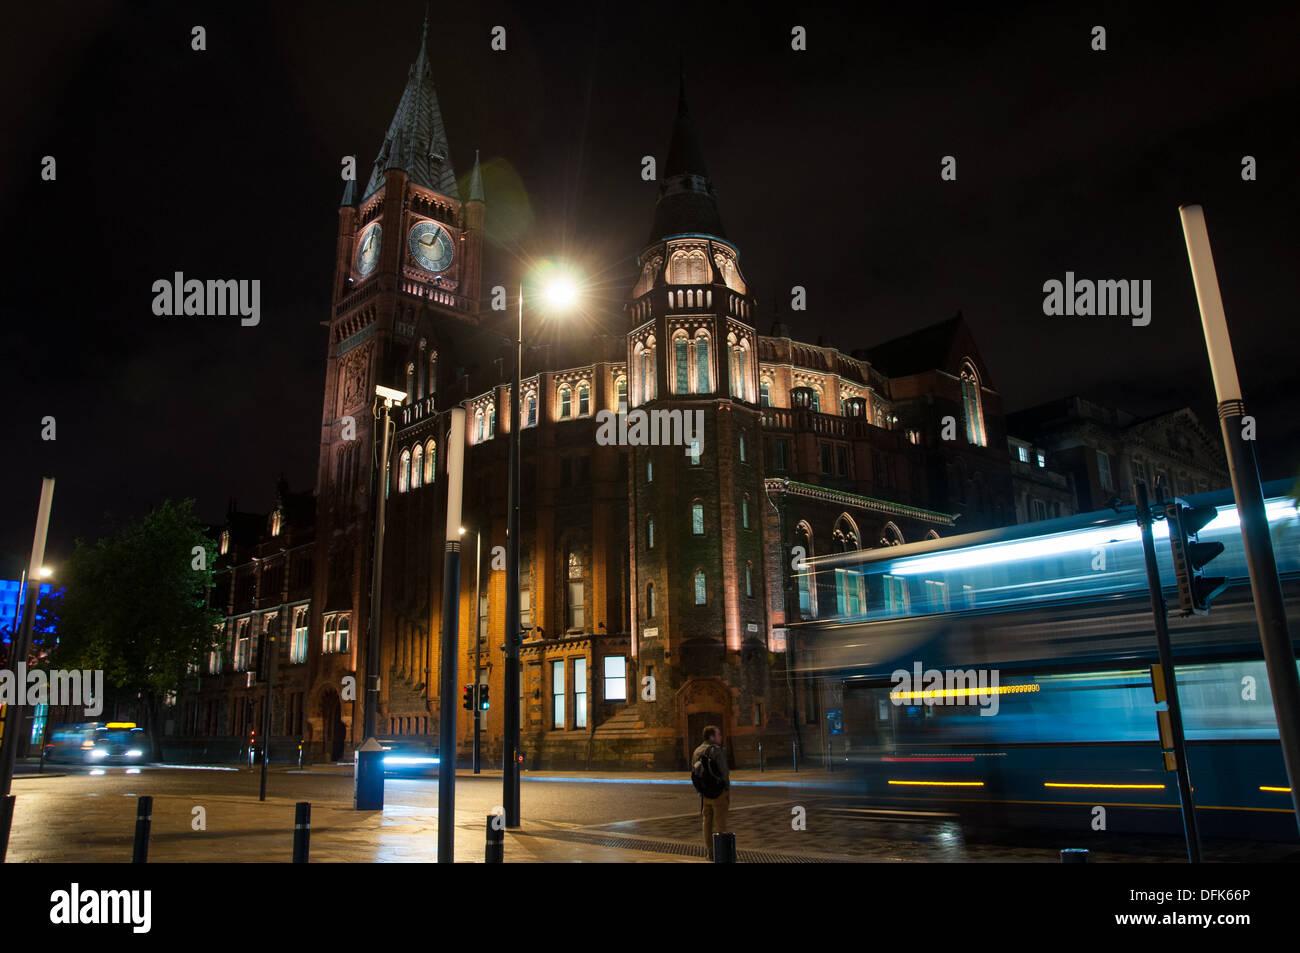 University of Liverpool at night - Stock Image